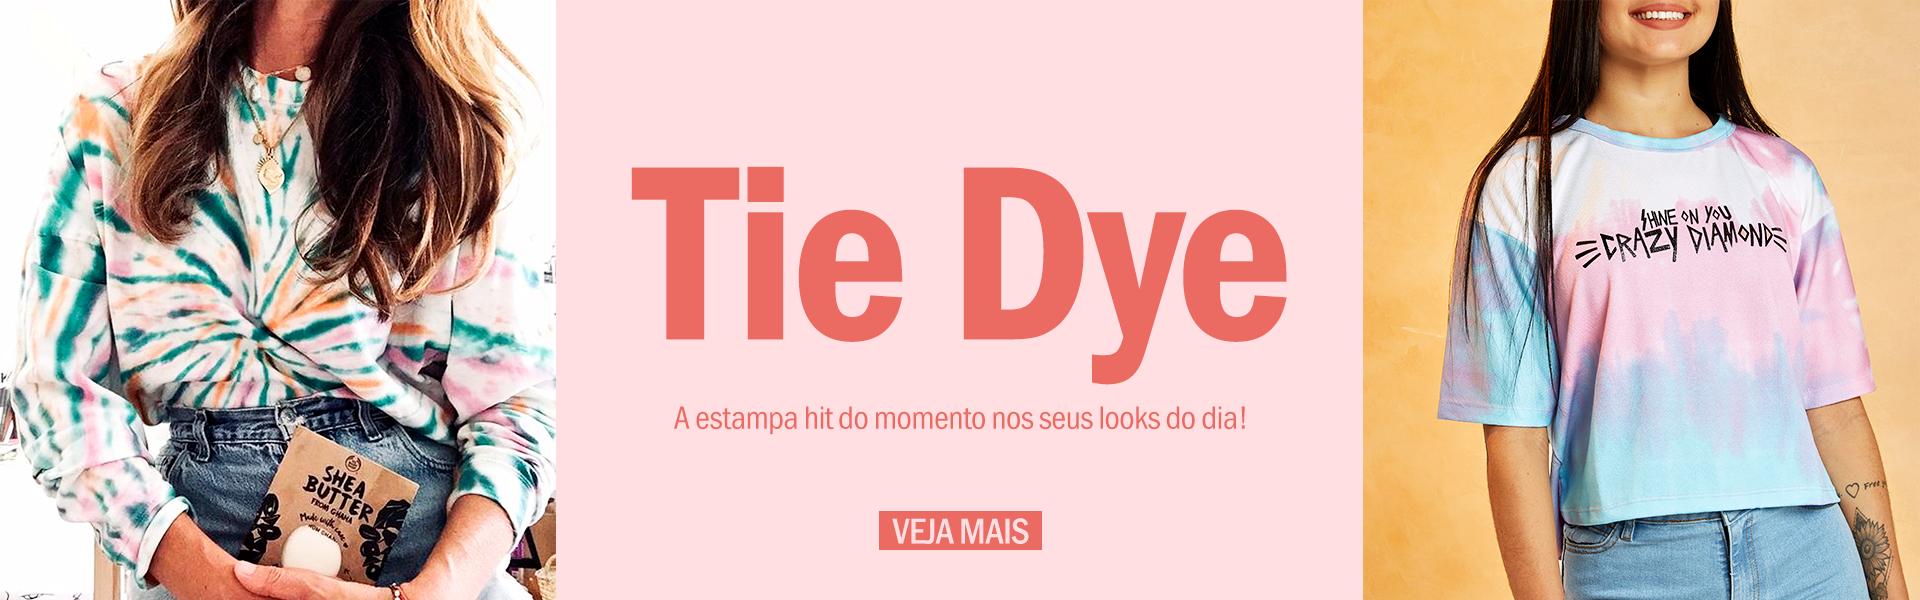 banner_1920x600_Tie_Dye_02